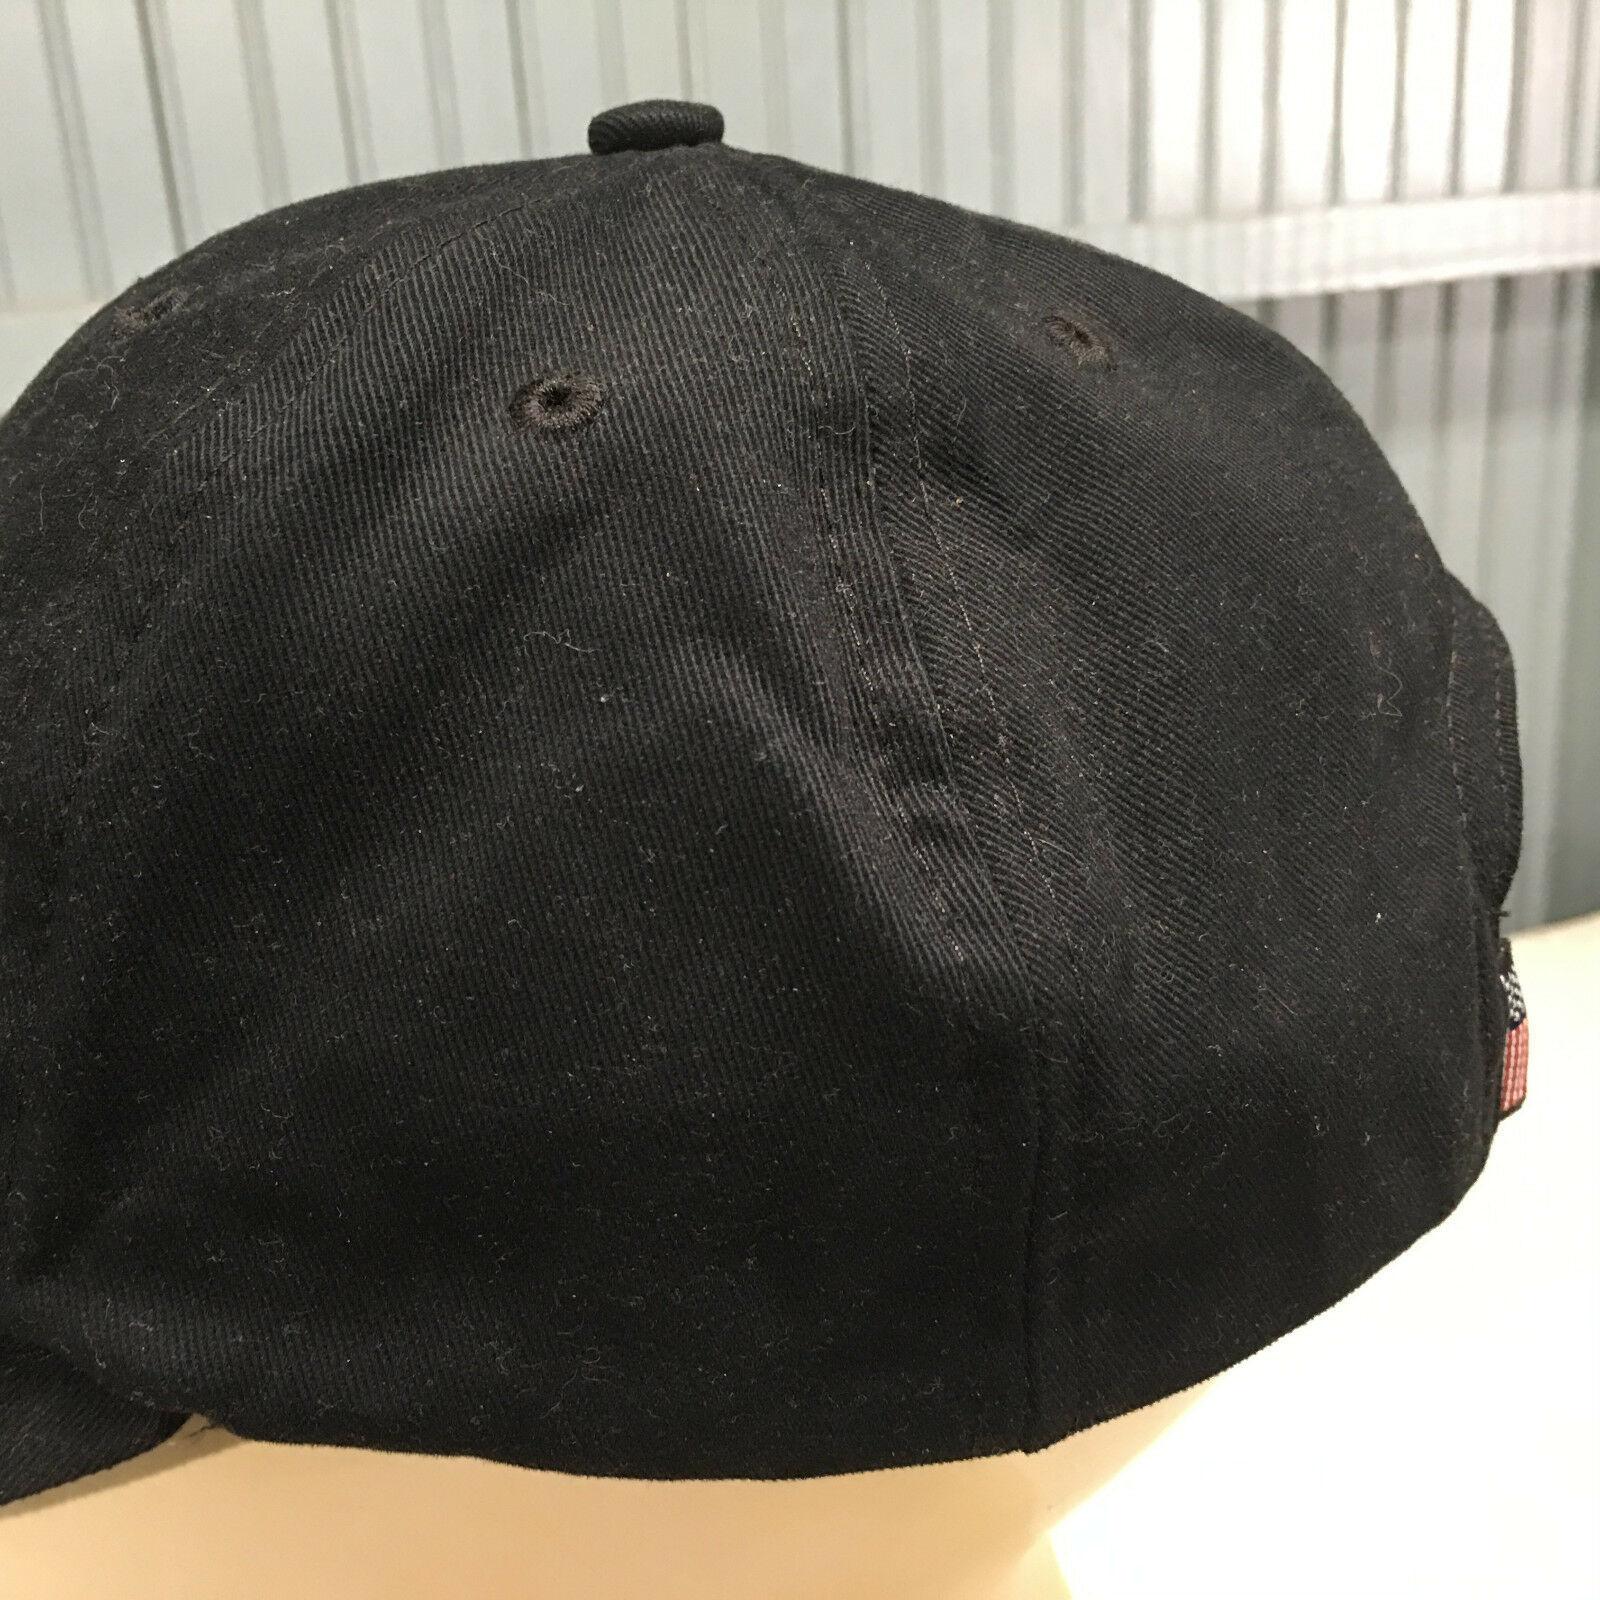 Eastern Express Trucking Big Rig Snapback Baseball Cap Hat Made in USA